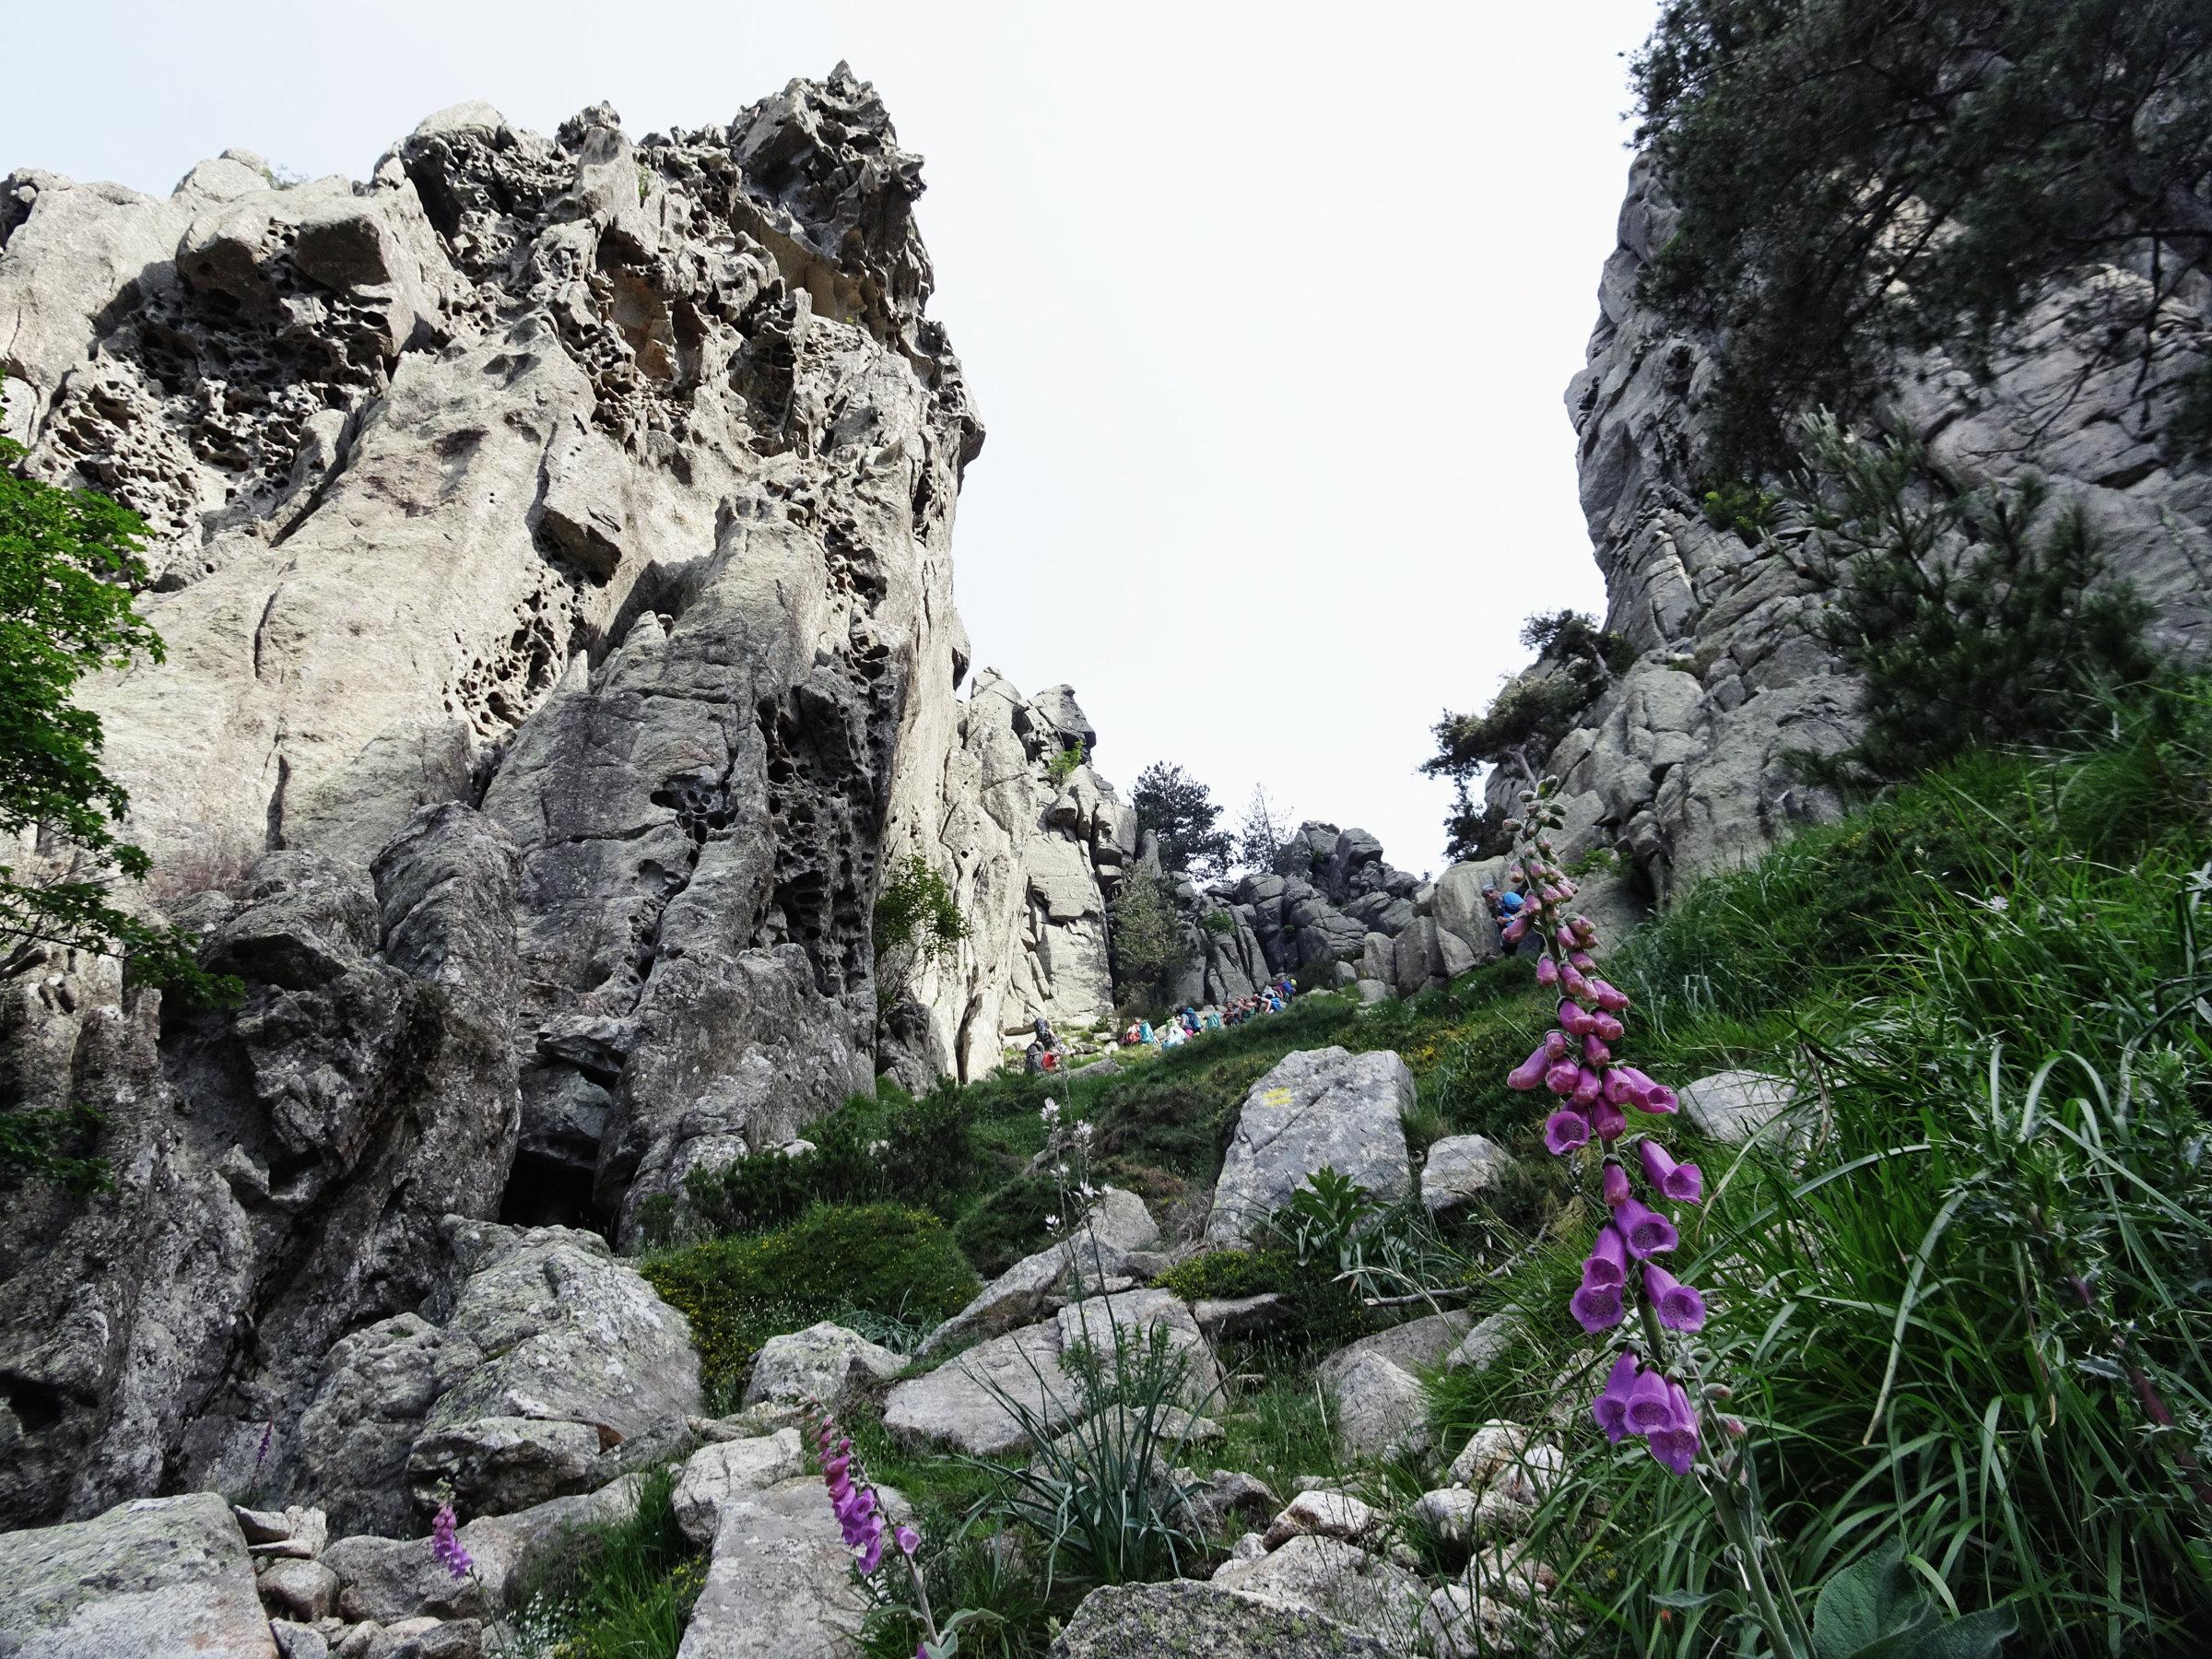 Verwitterte Felsen am GR20, Korsika, GR20 Weitwanderweg, Wandern, Berge, Frankreich